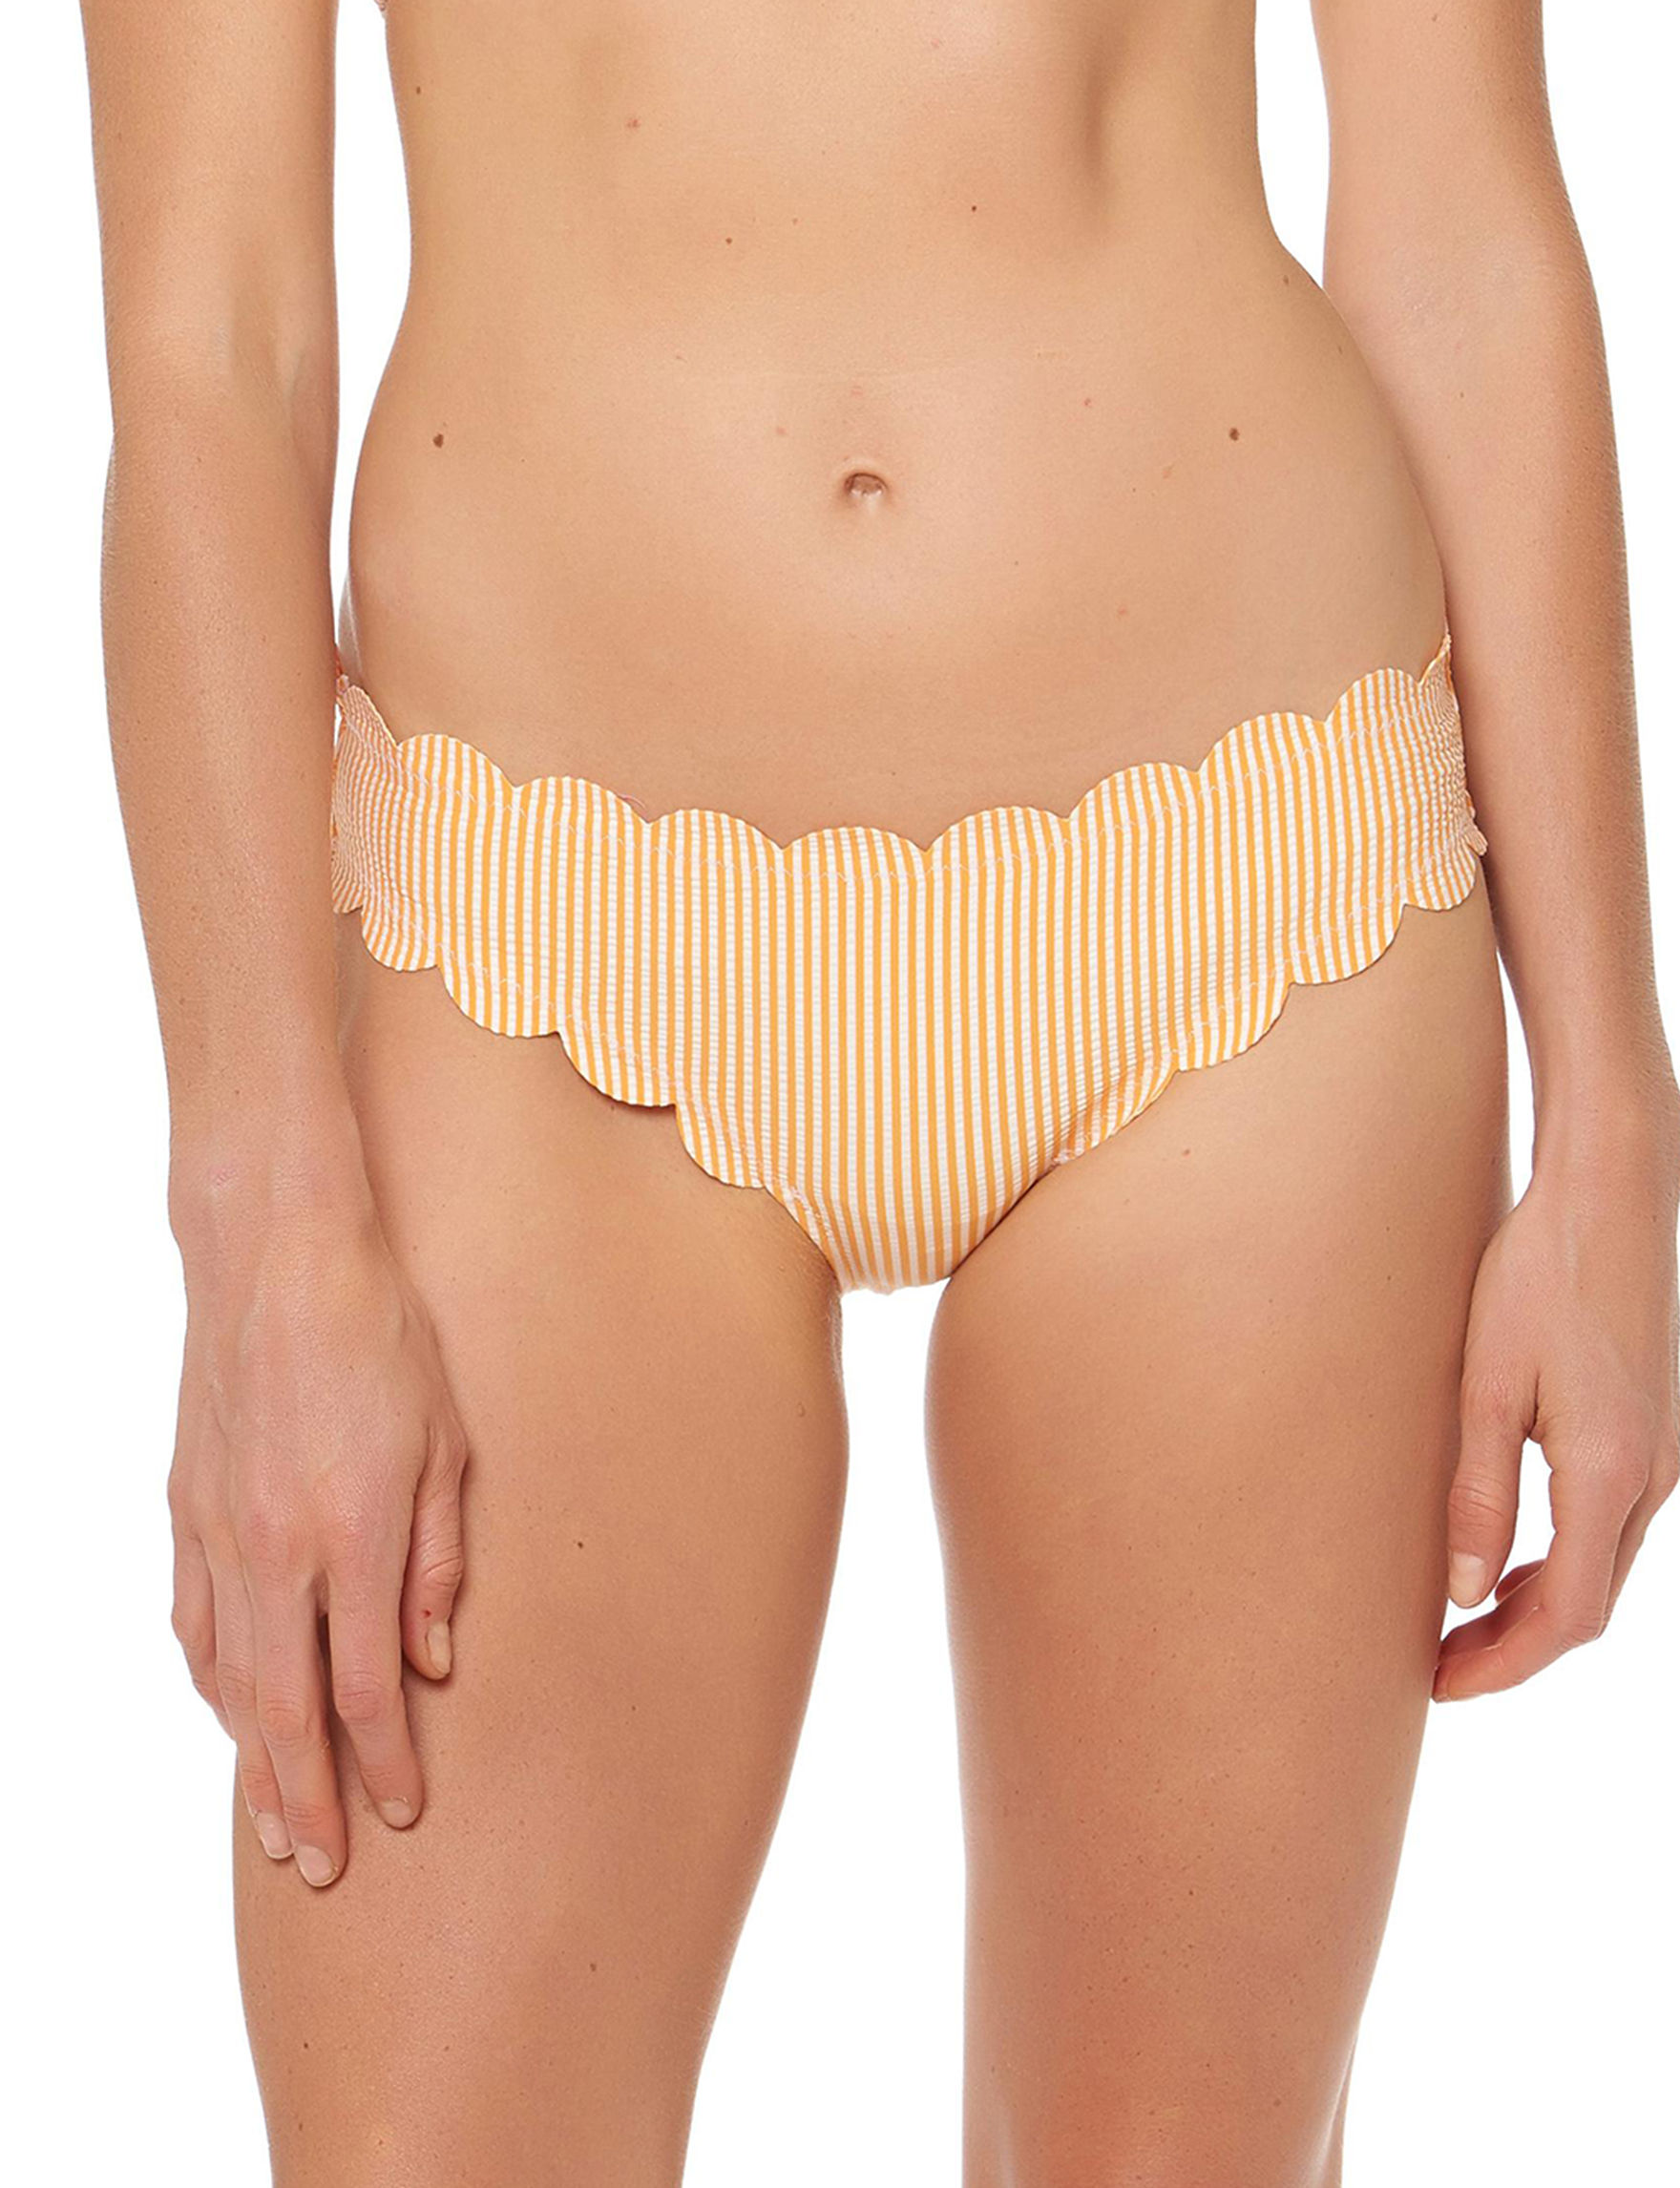 Jessica Simpson Orange Swimsuit Bottoms Hipster